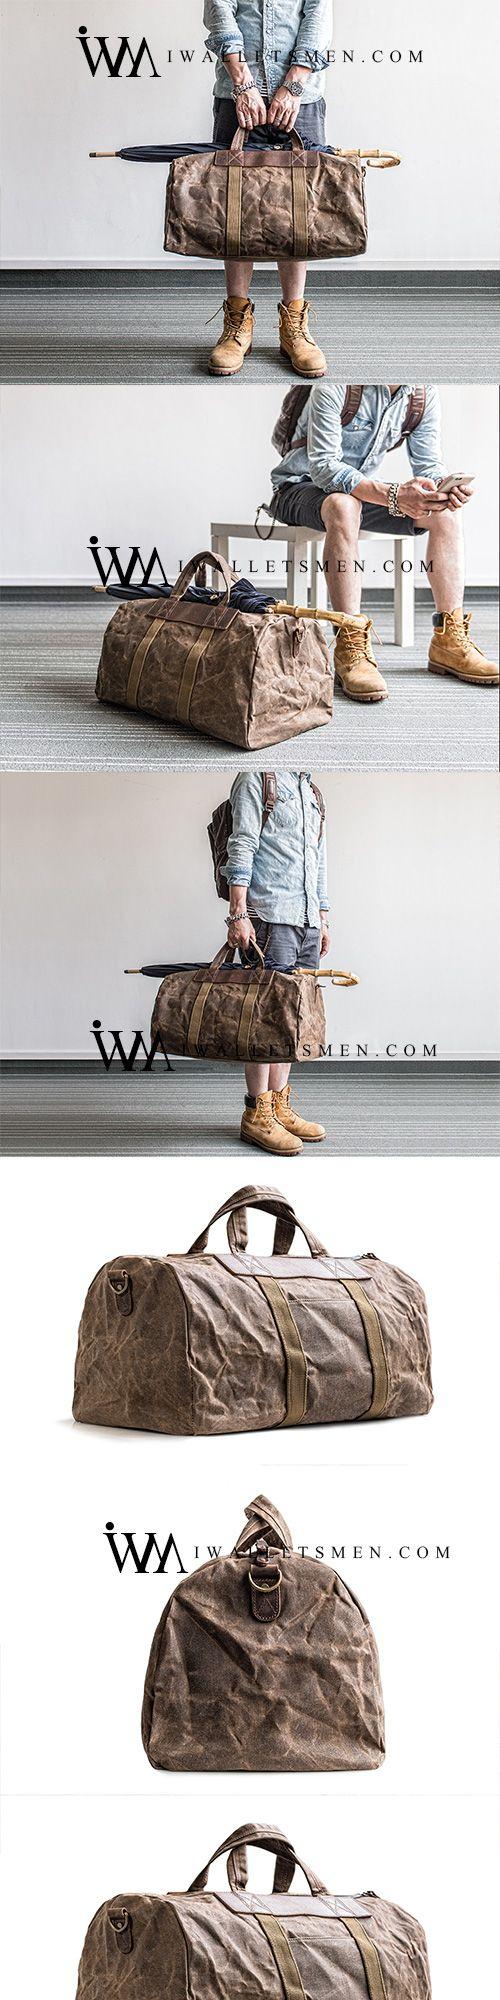 CANVAS MENS COOL WEEKENDER BAG TRAVEL BAG DUFFLE BAGS OVERNIGHT BAG HOLDALL BAG FOR MEN